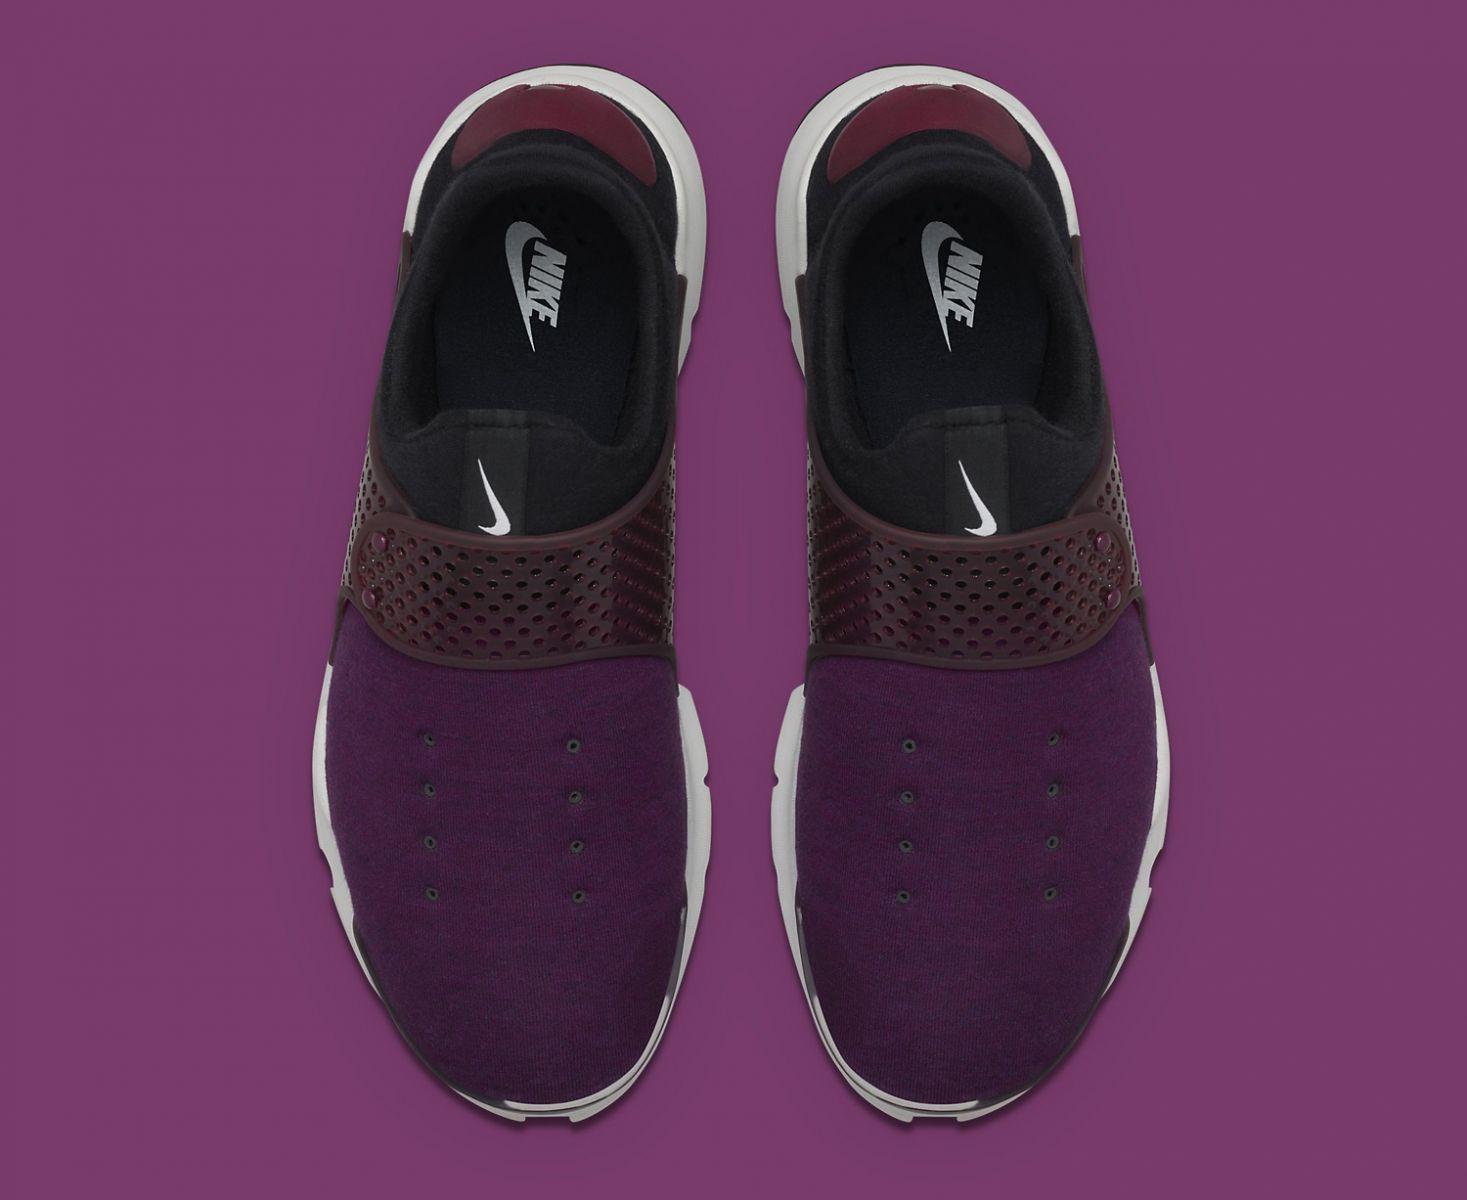 nike-sock-dart-fleece-sp-purple-03.jpg